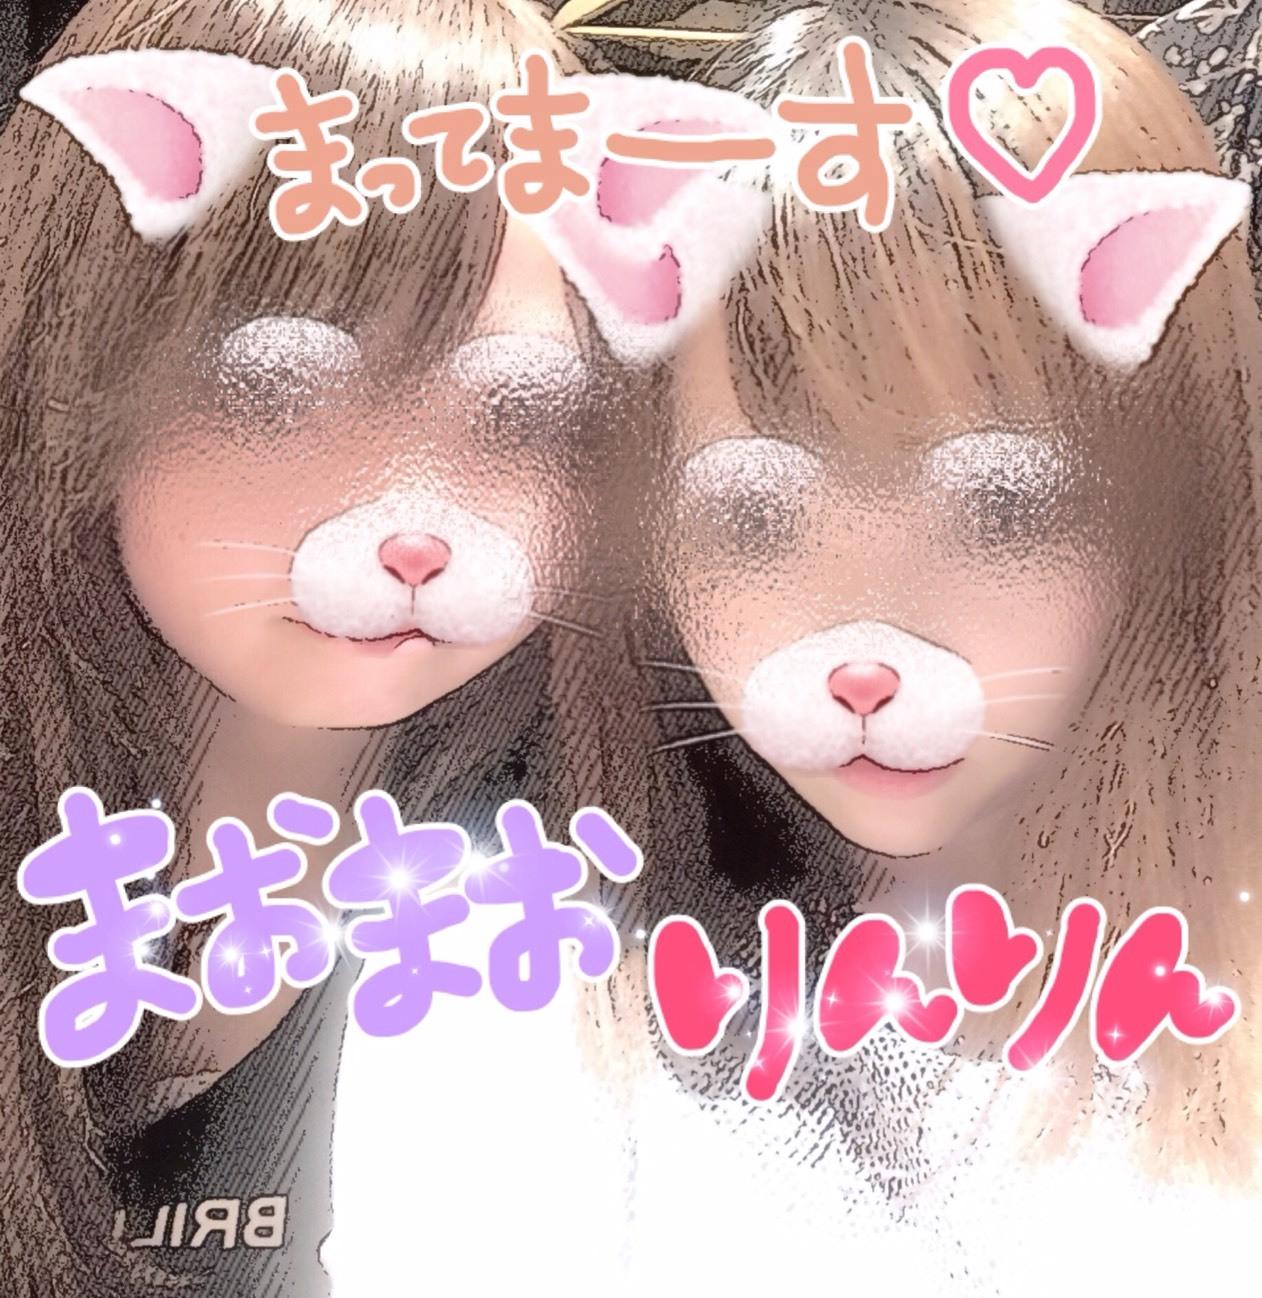 S__34643977.jpg